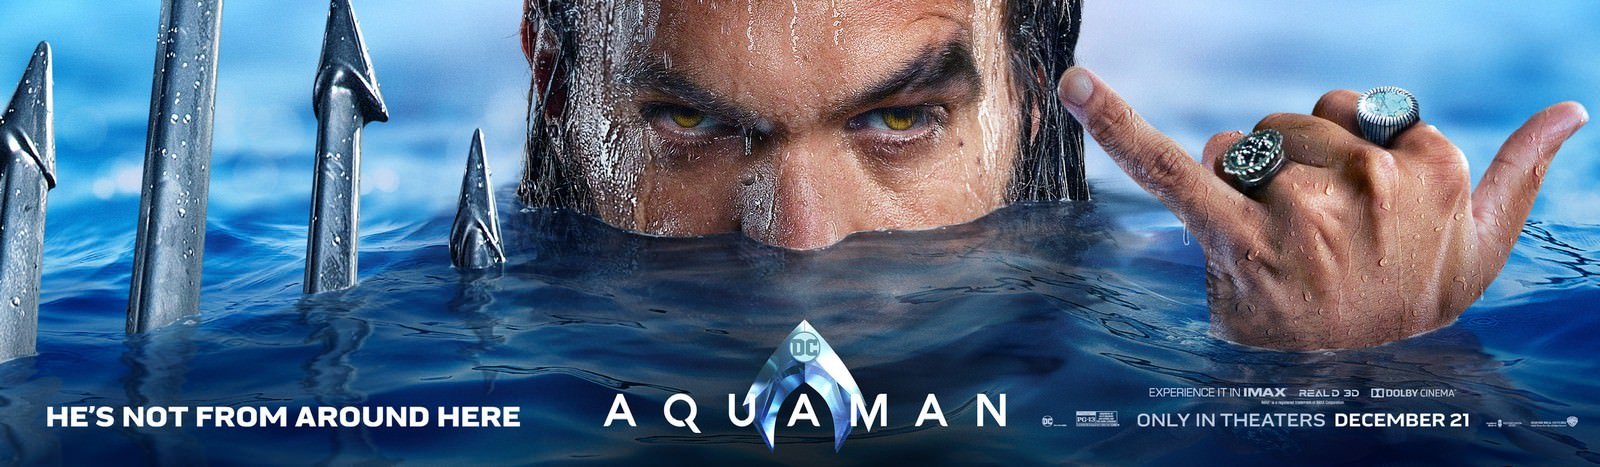 Movie, Aquaman(美國, 2018年) / 水行俠(台灣.香港) / 海王(中國), 電影海報, 美國, 橫版